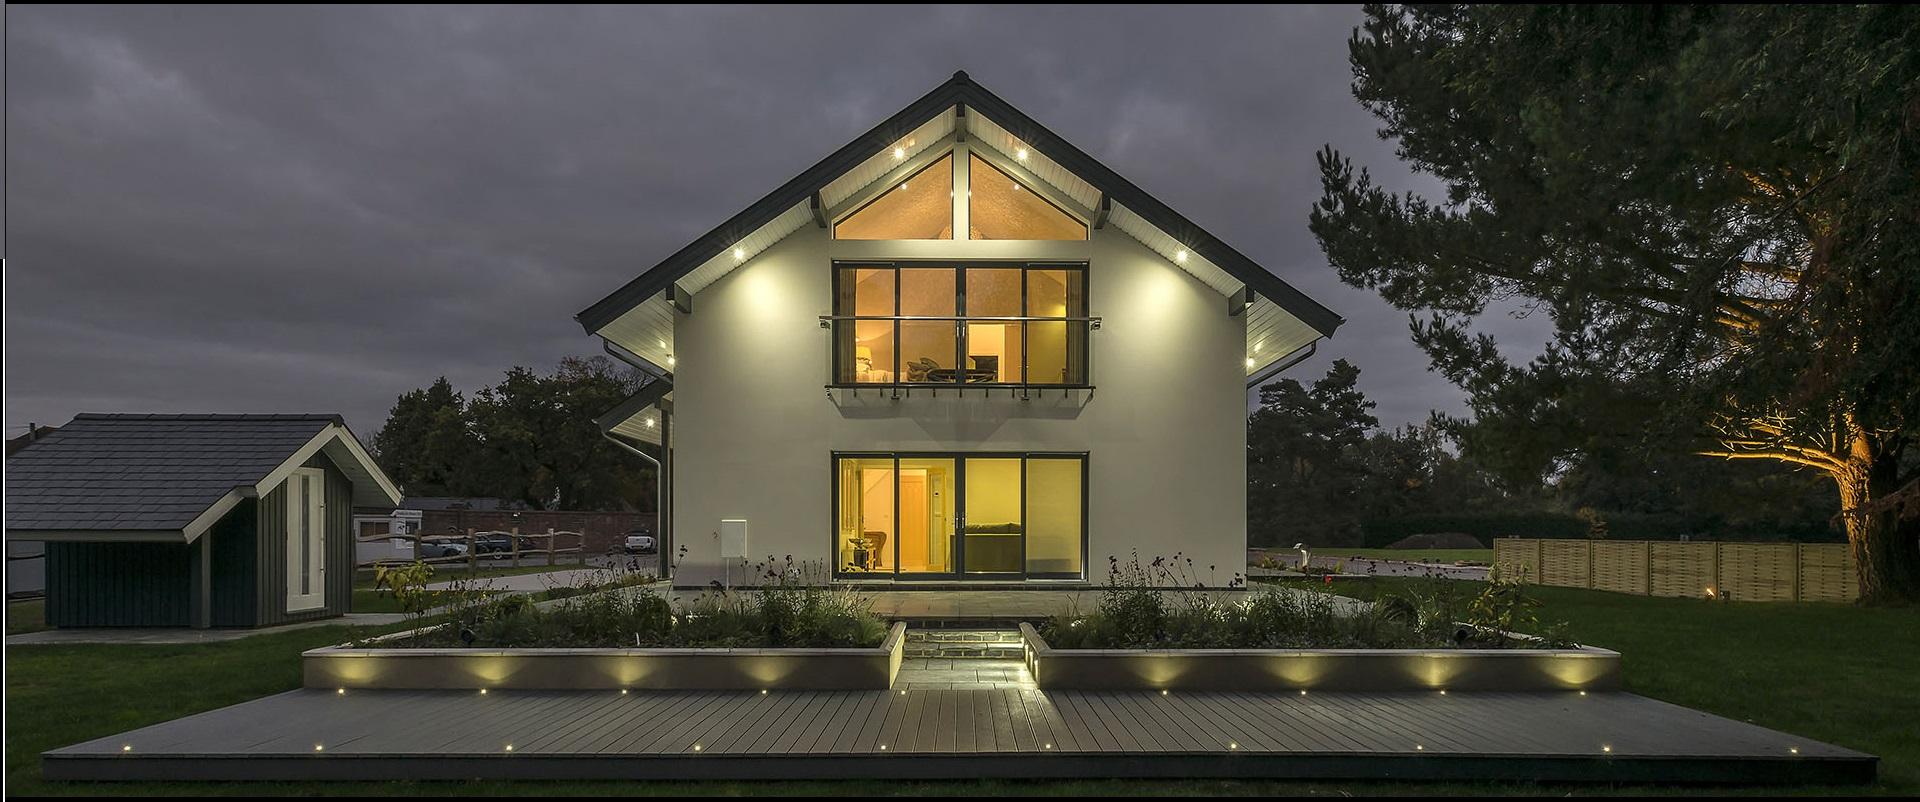 house build bradford